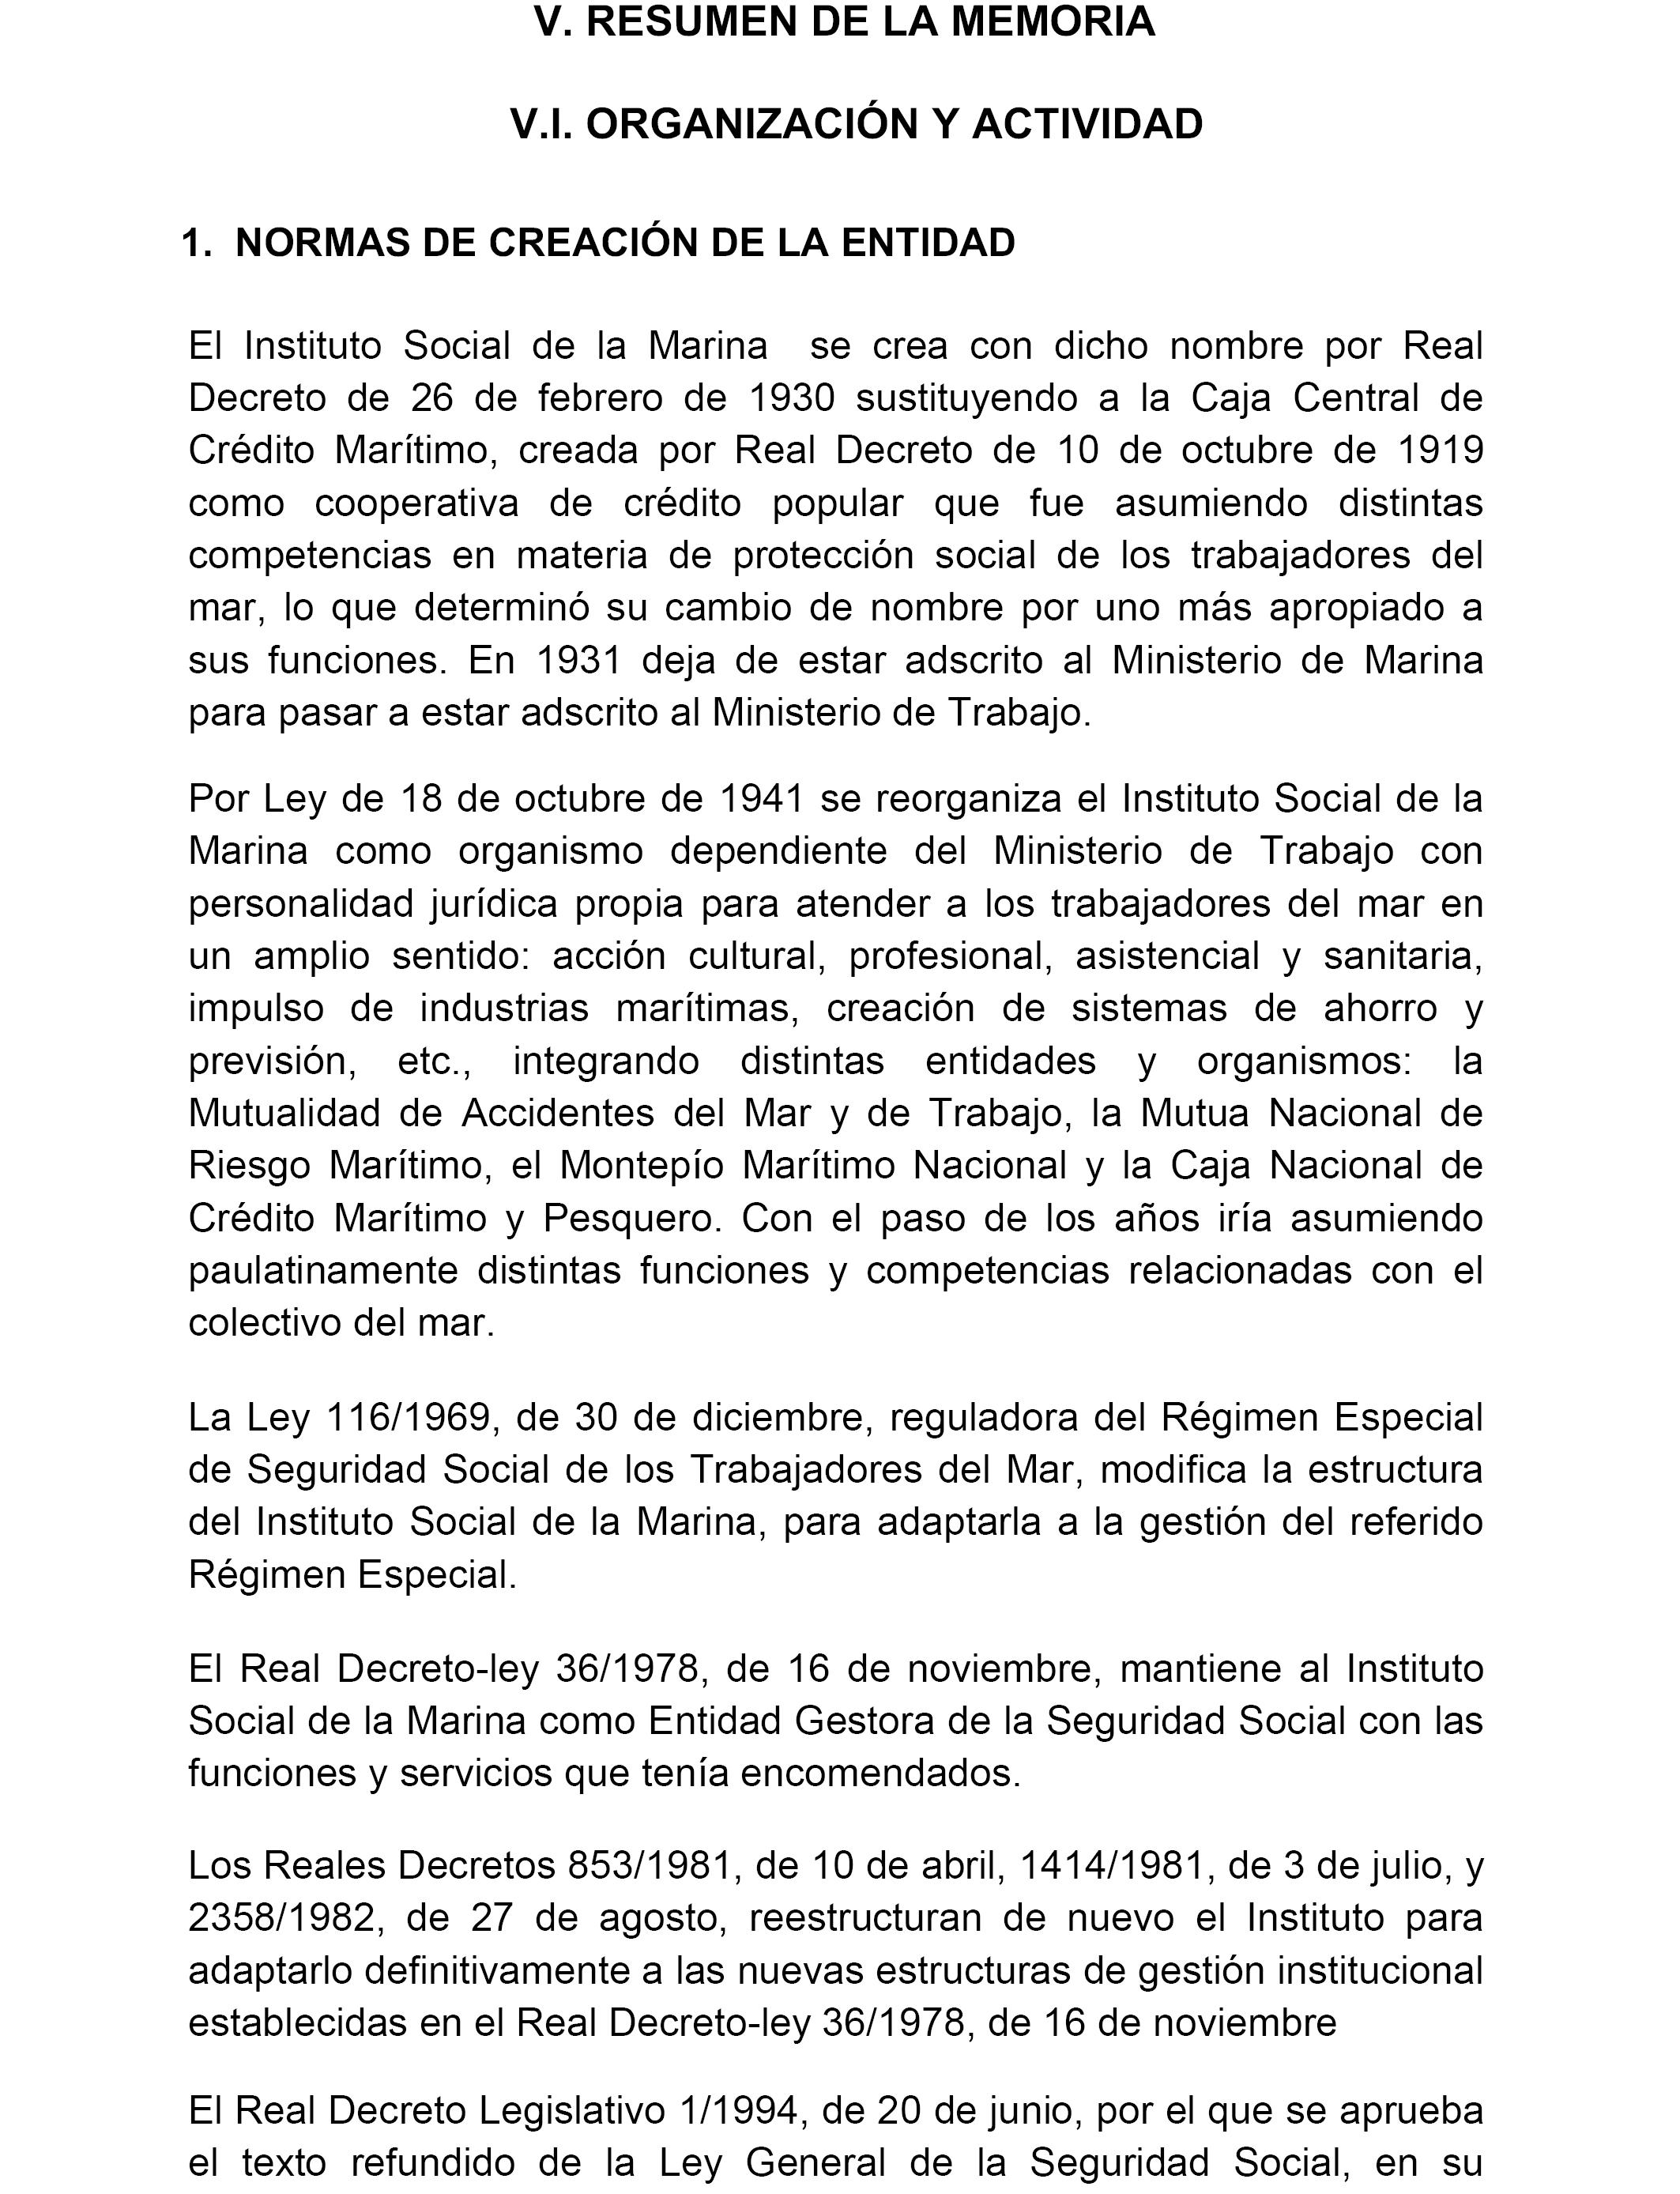 BOE.es - Documento BOE-A-2016-11782